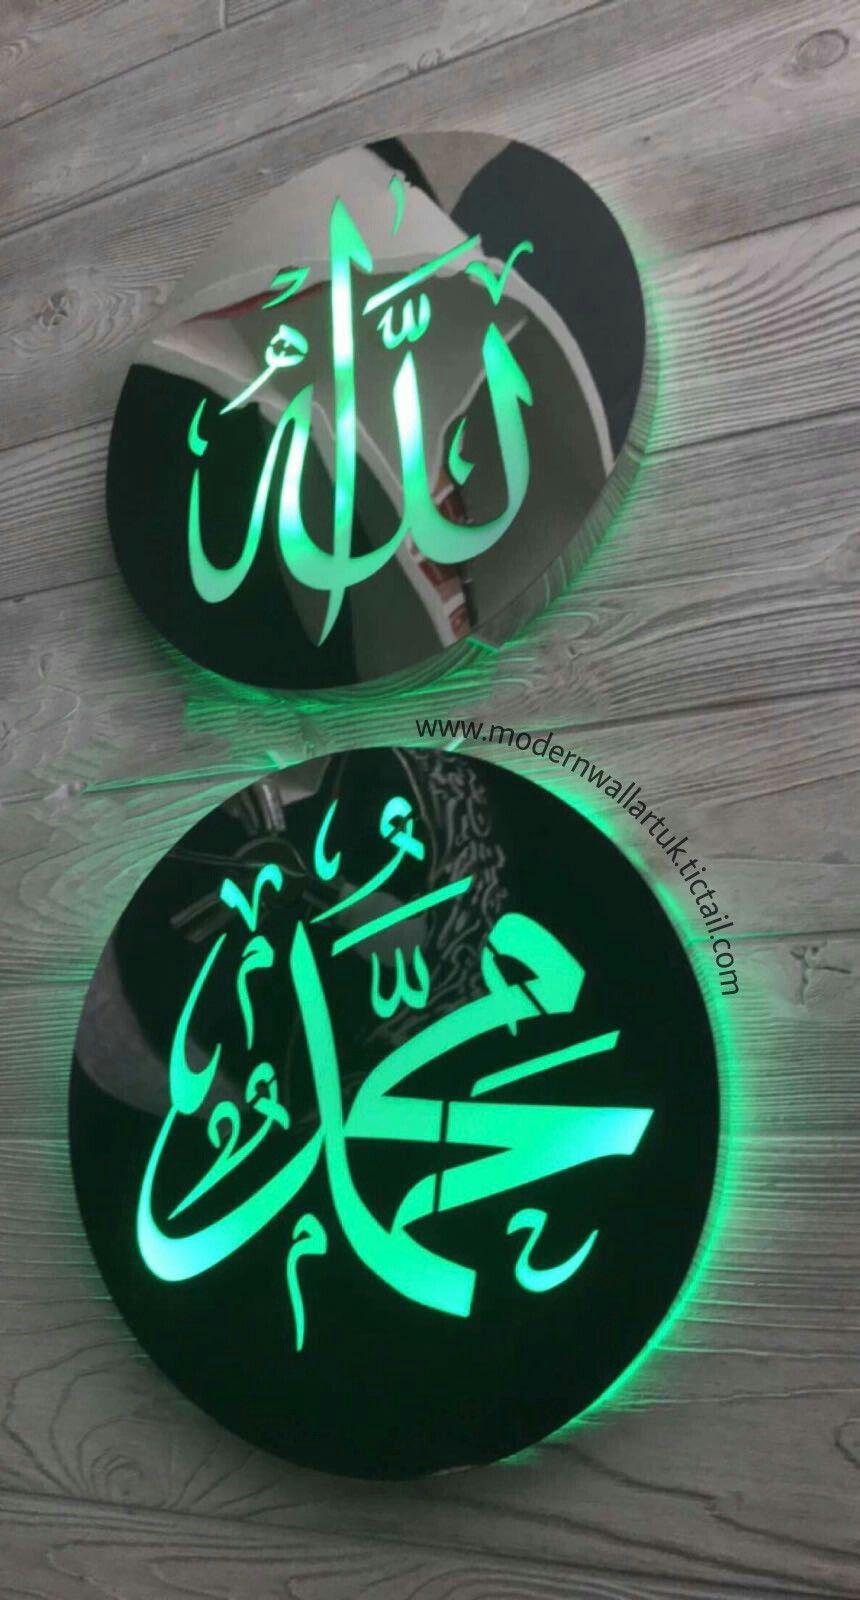 Led Ayatul Kursi Wall Art Designed In A Large Circular Stainless Steel That Beautifully Sits A Little Eleva Wall Art Uk Islamic Art Calligraphy Modern Wall Art